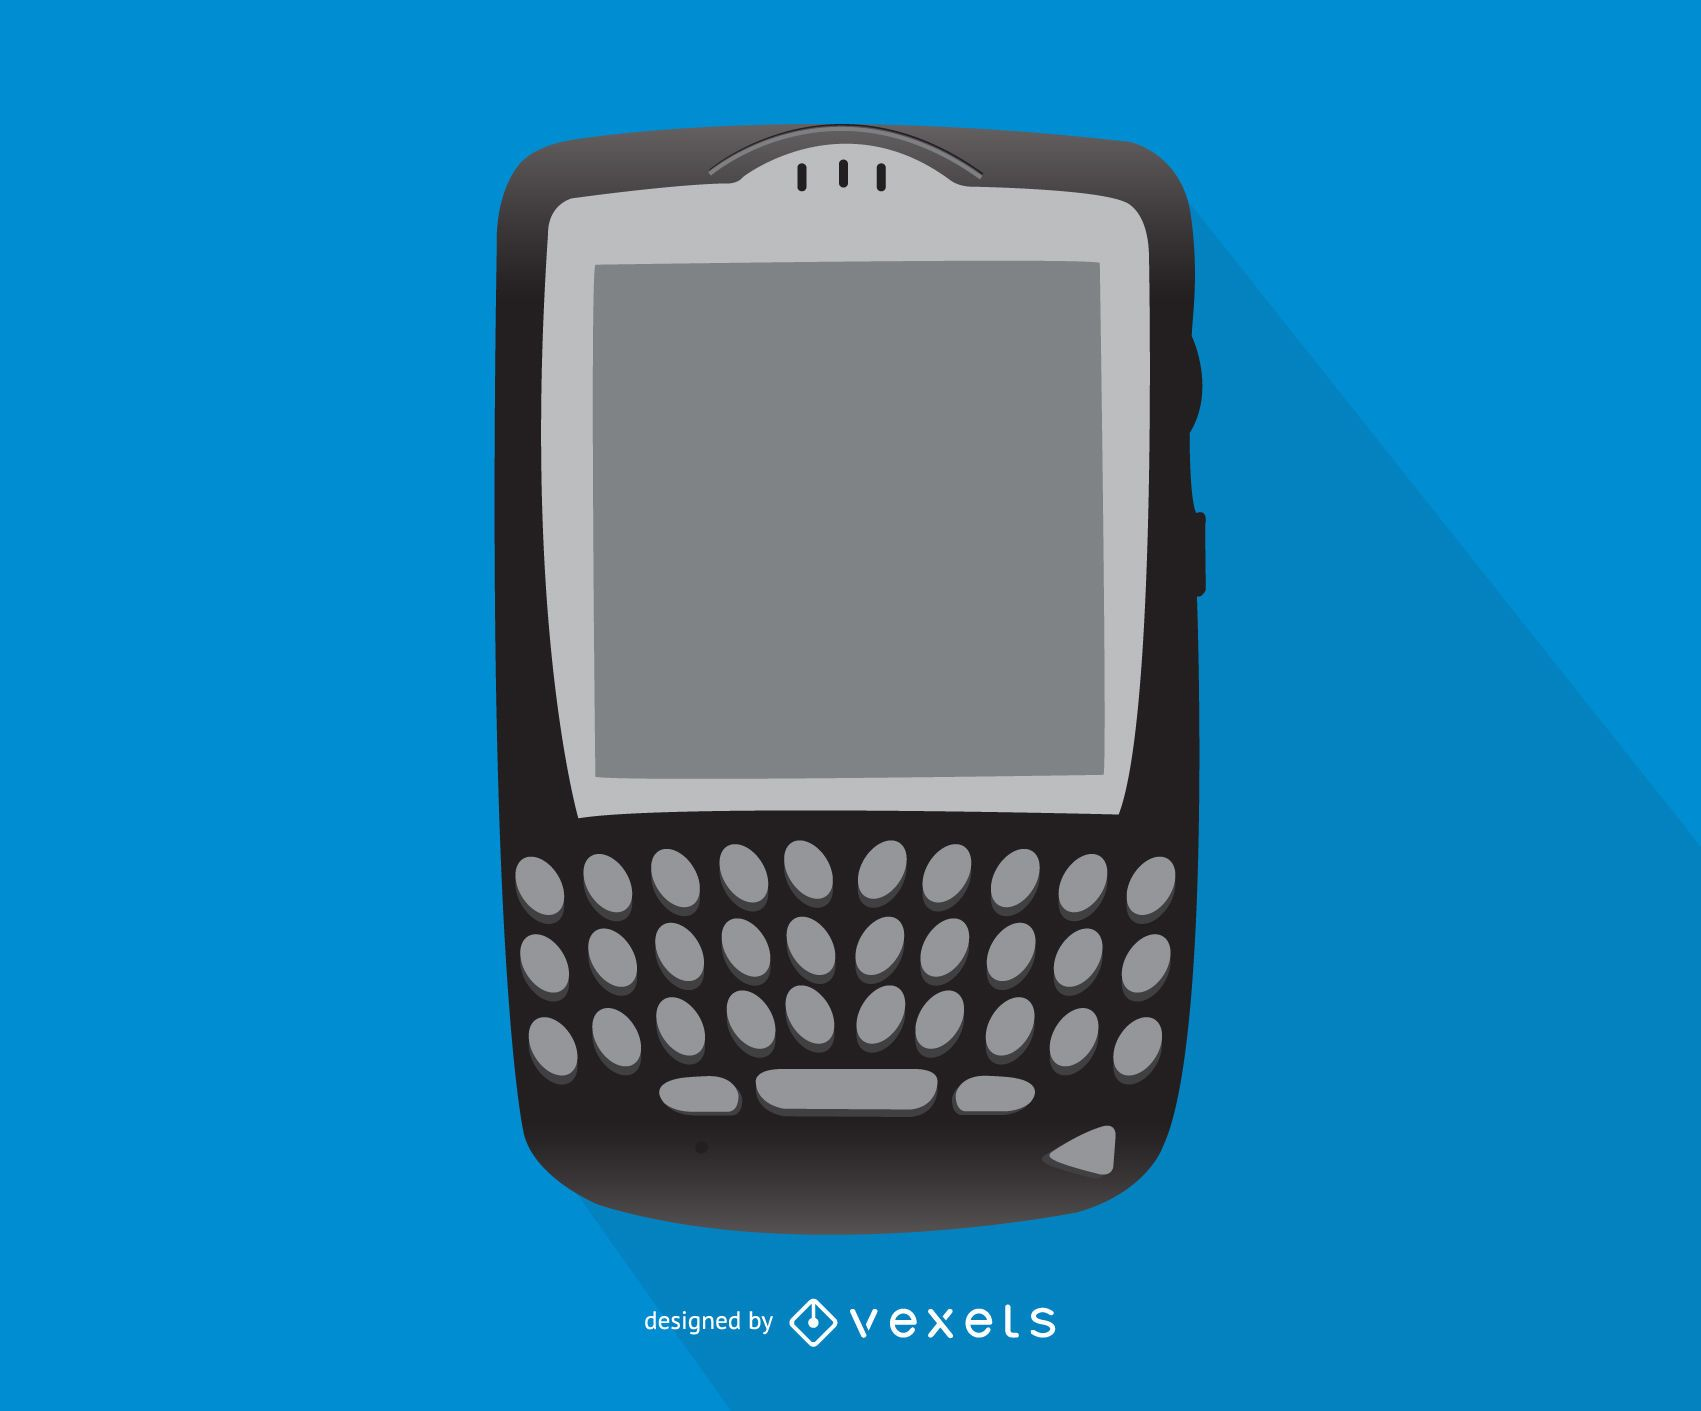 Blackberry smartphone illustration